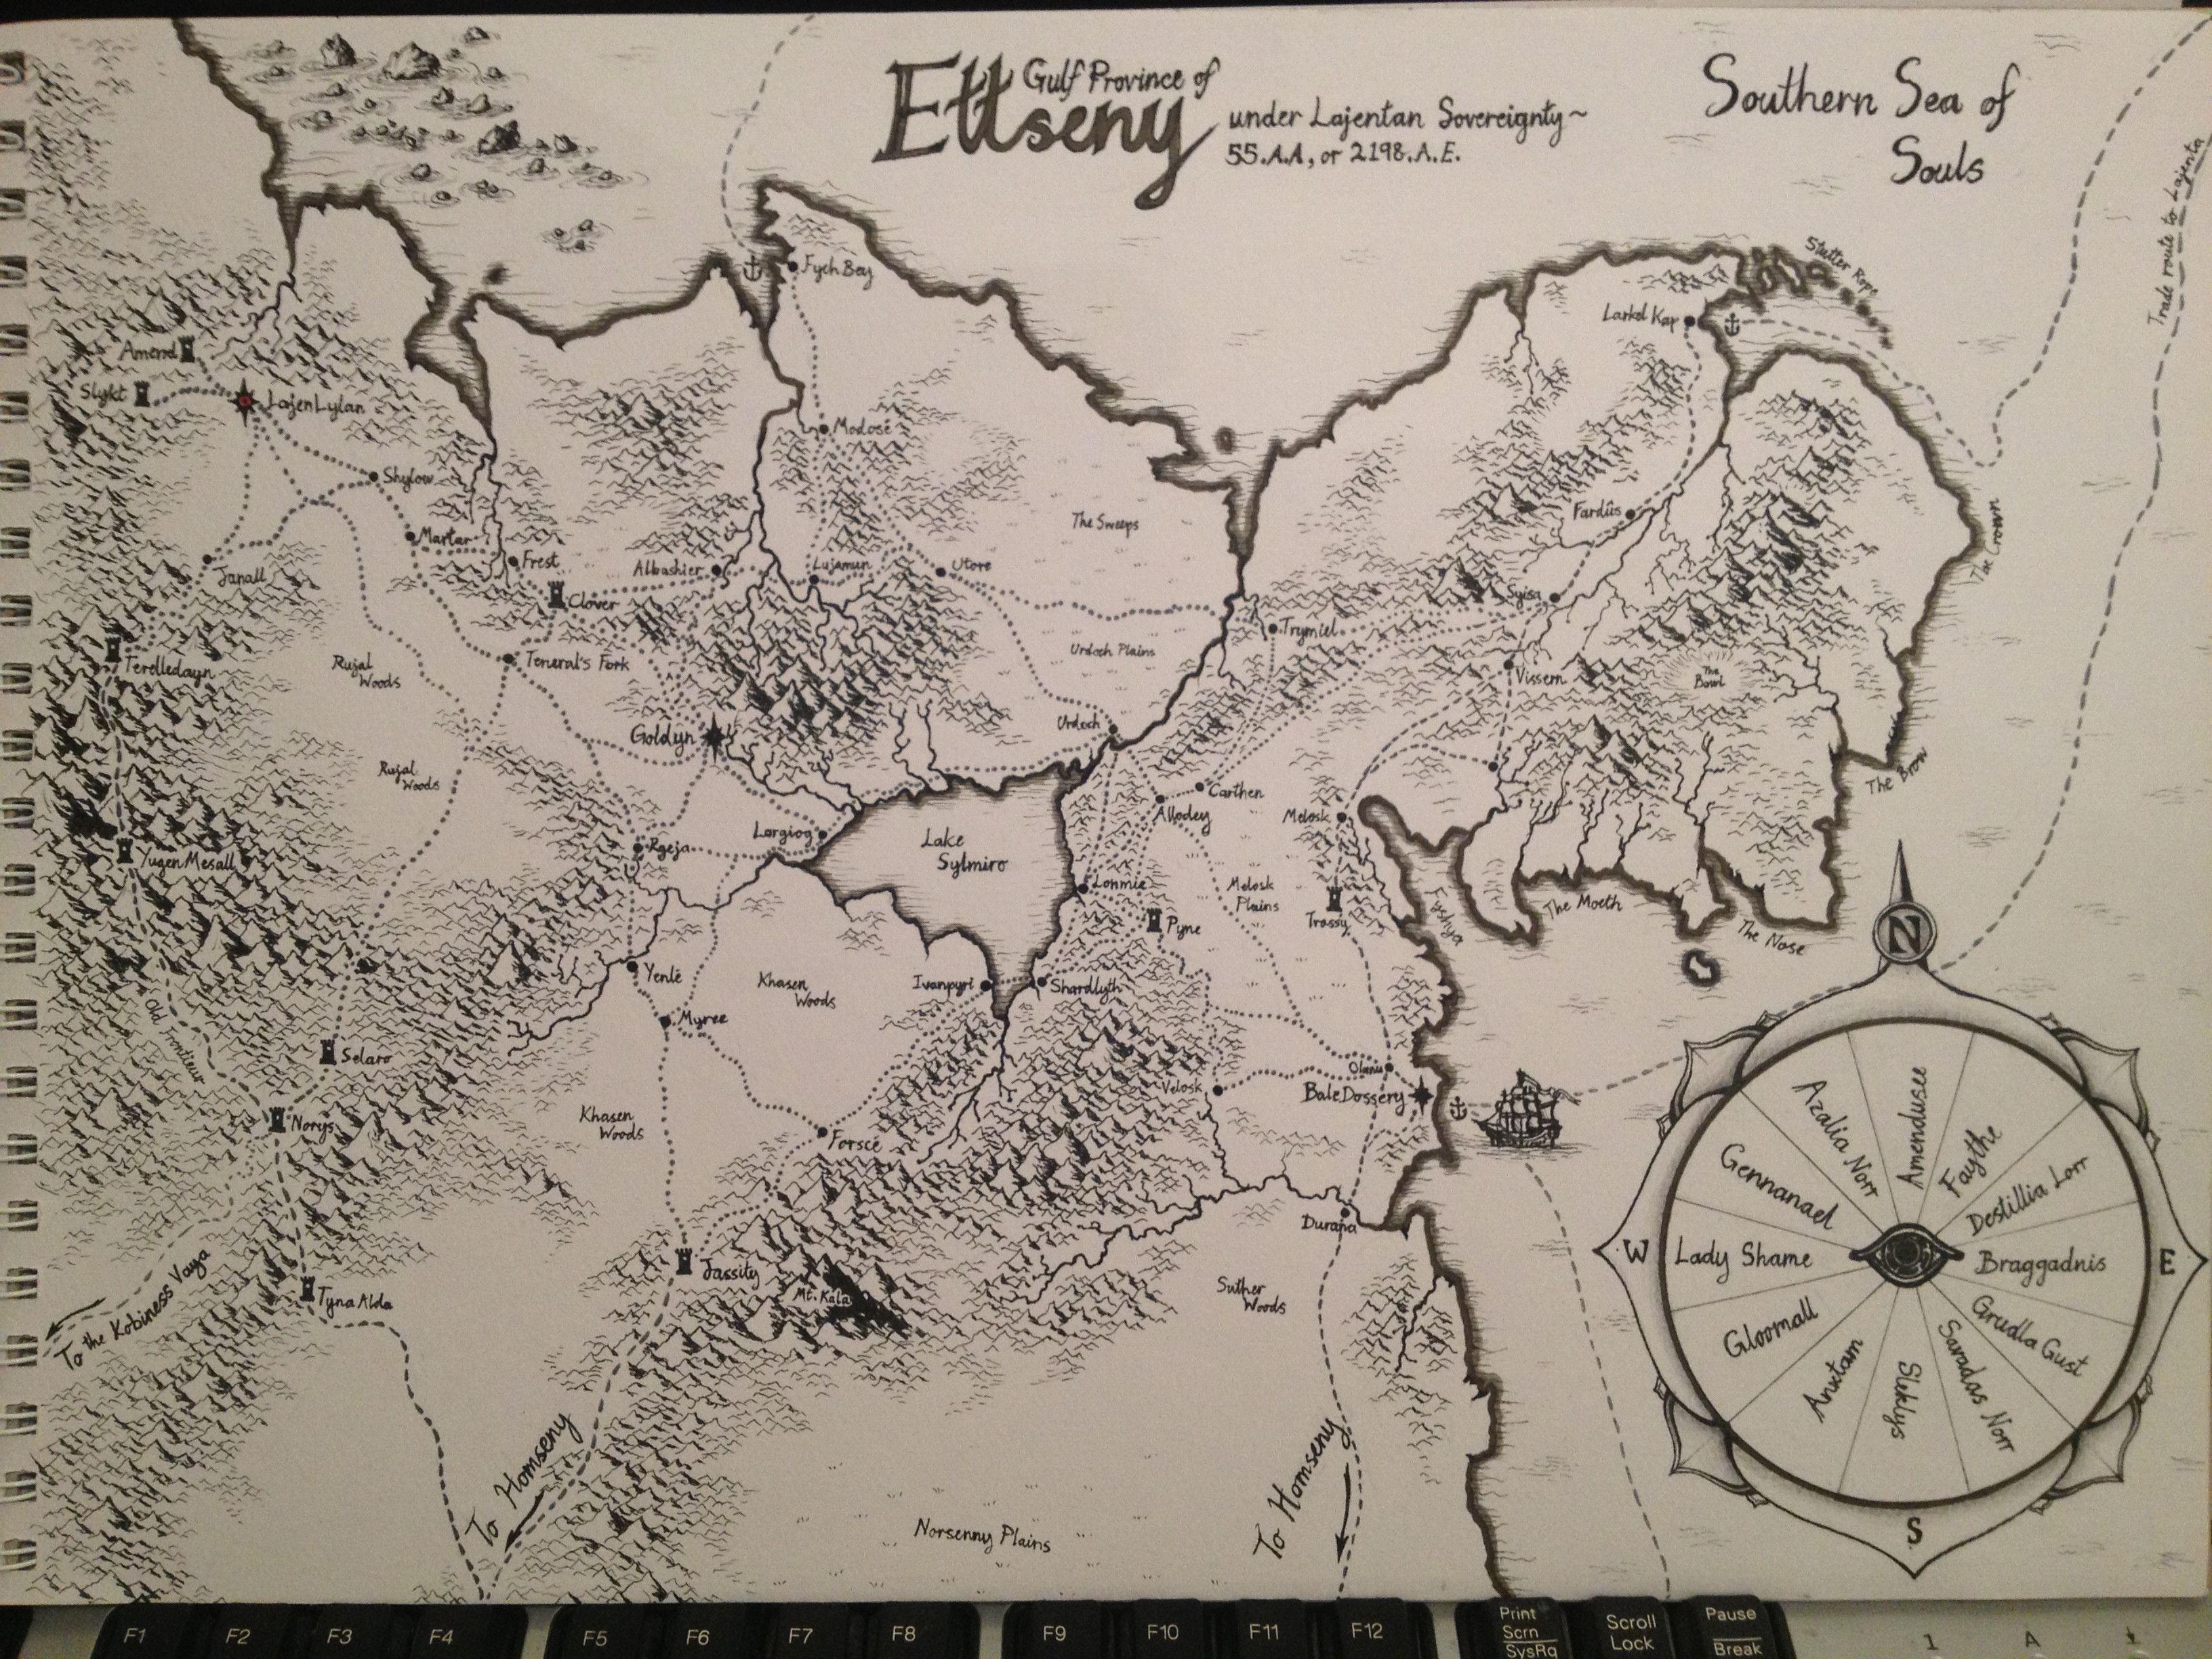 Fantasy map The province of Ettseny completely